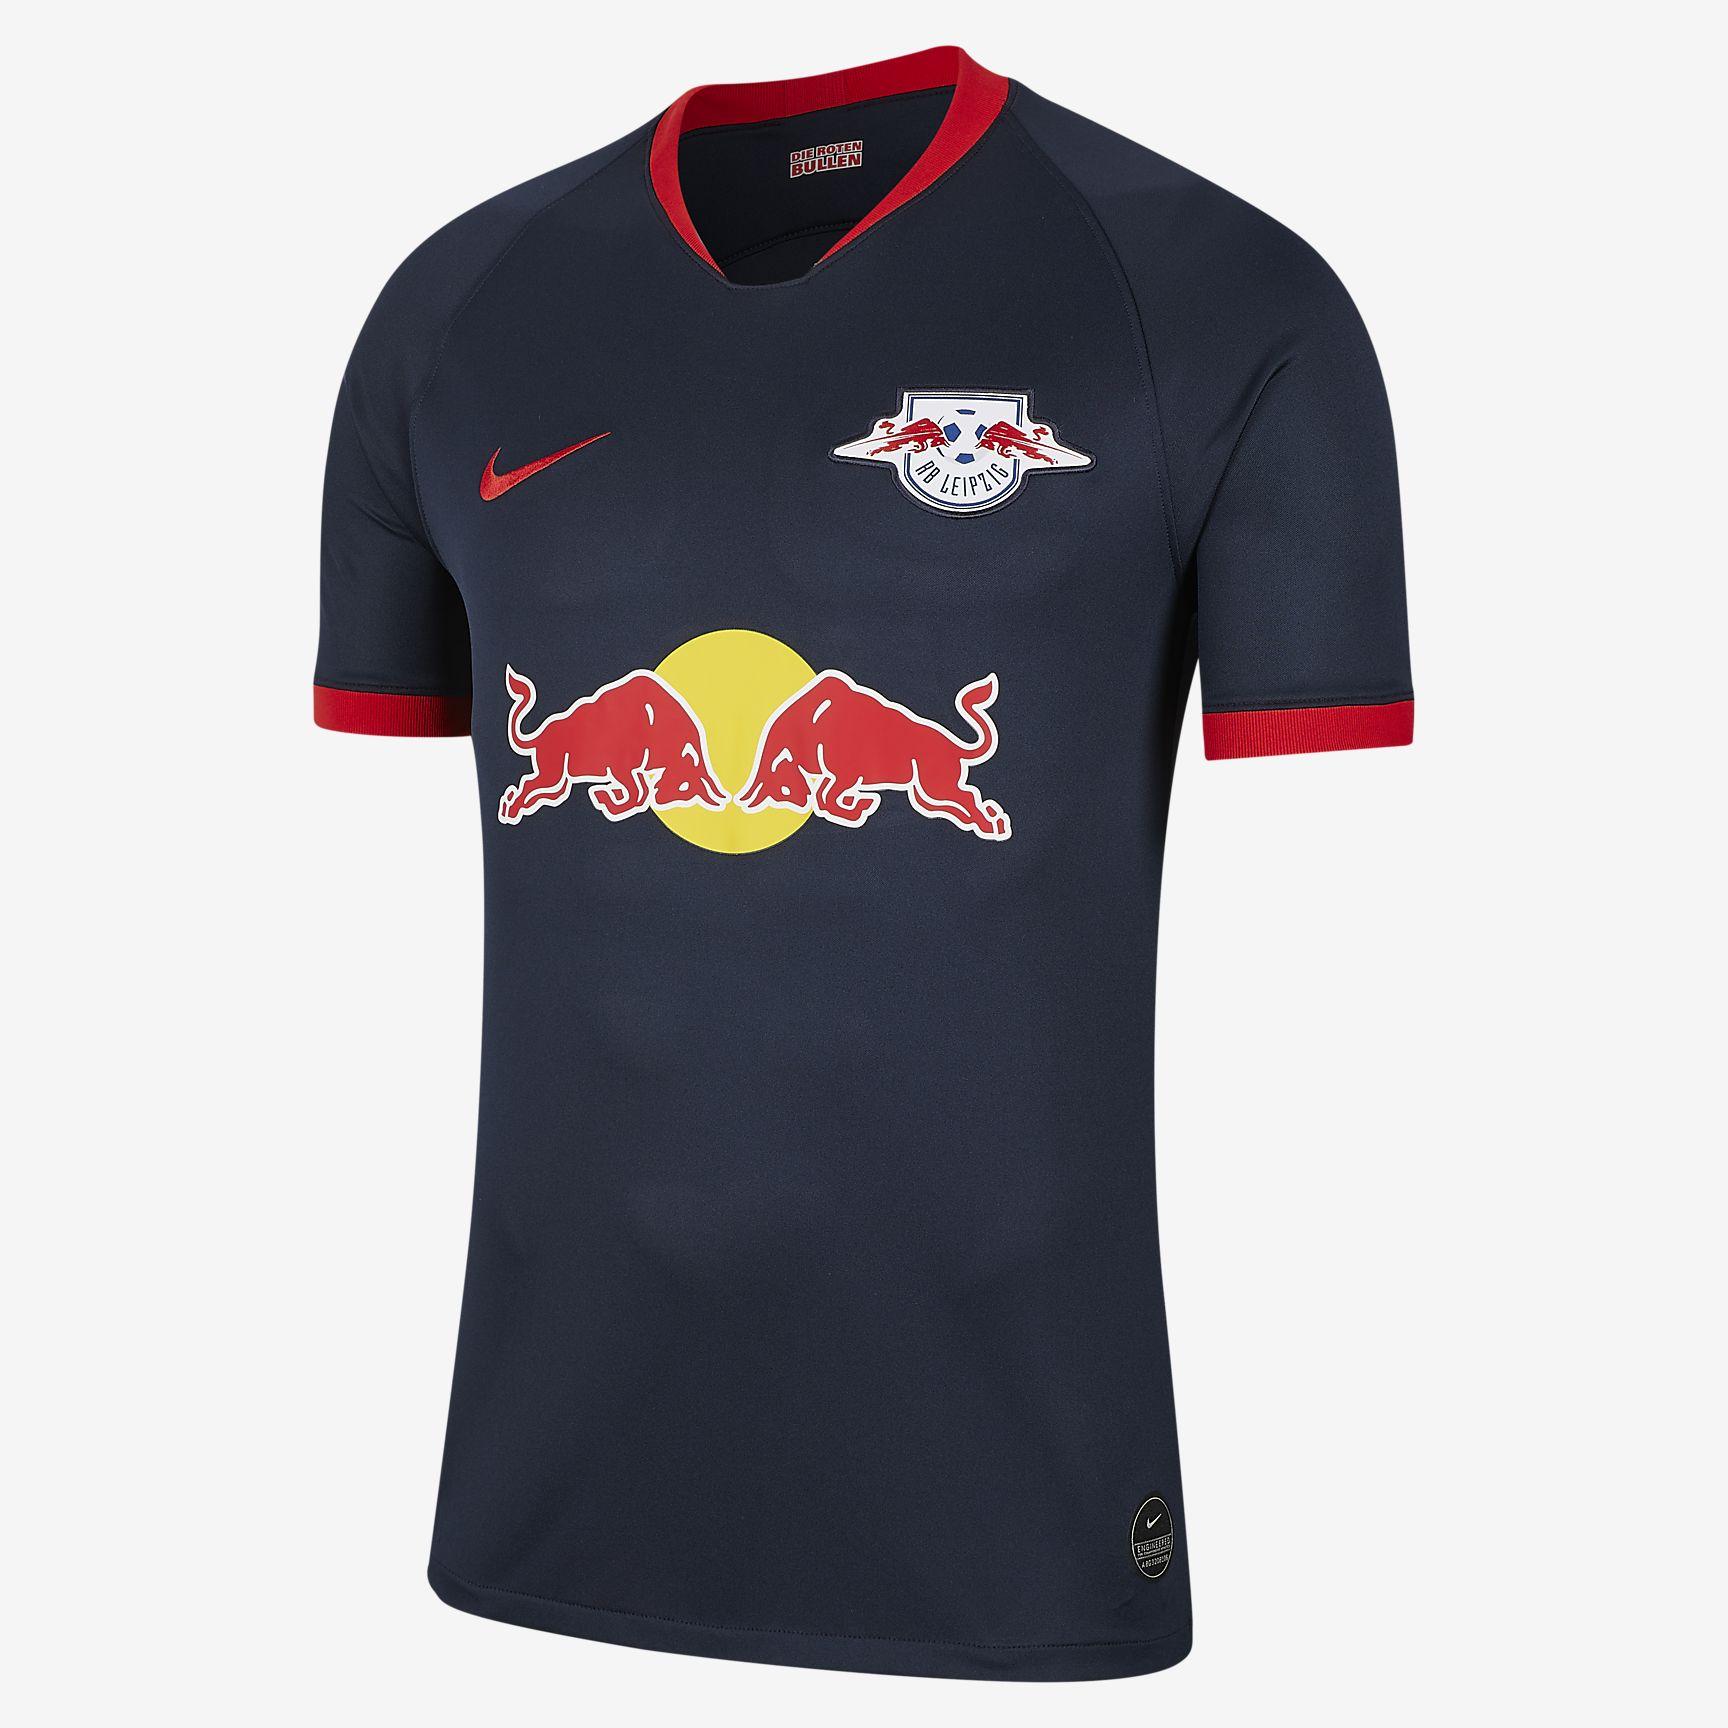 Maillot de football Nike RB Leipzig extérieur - Saison 2019/2020